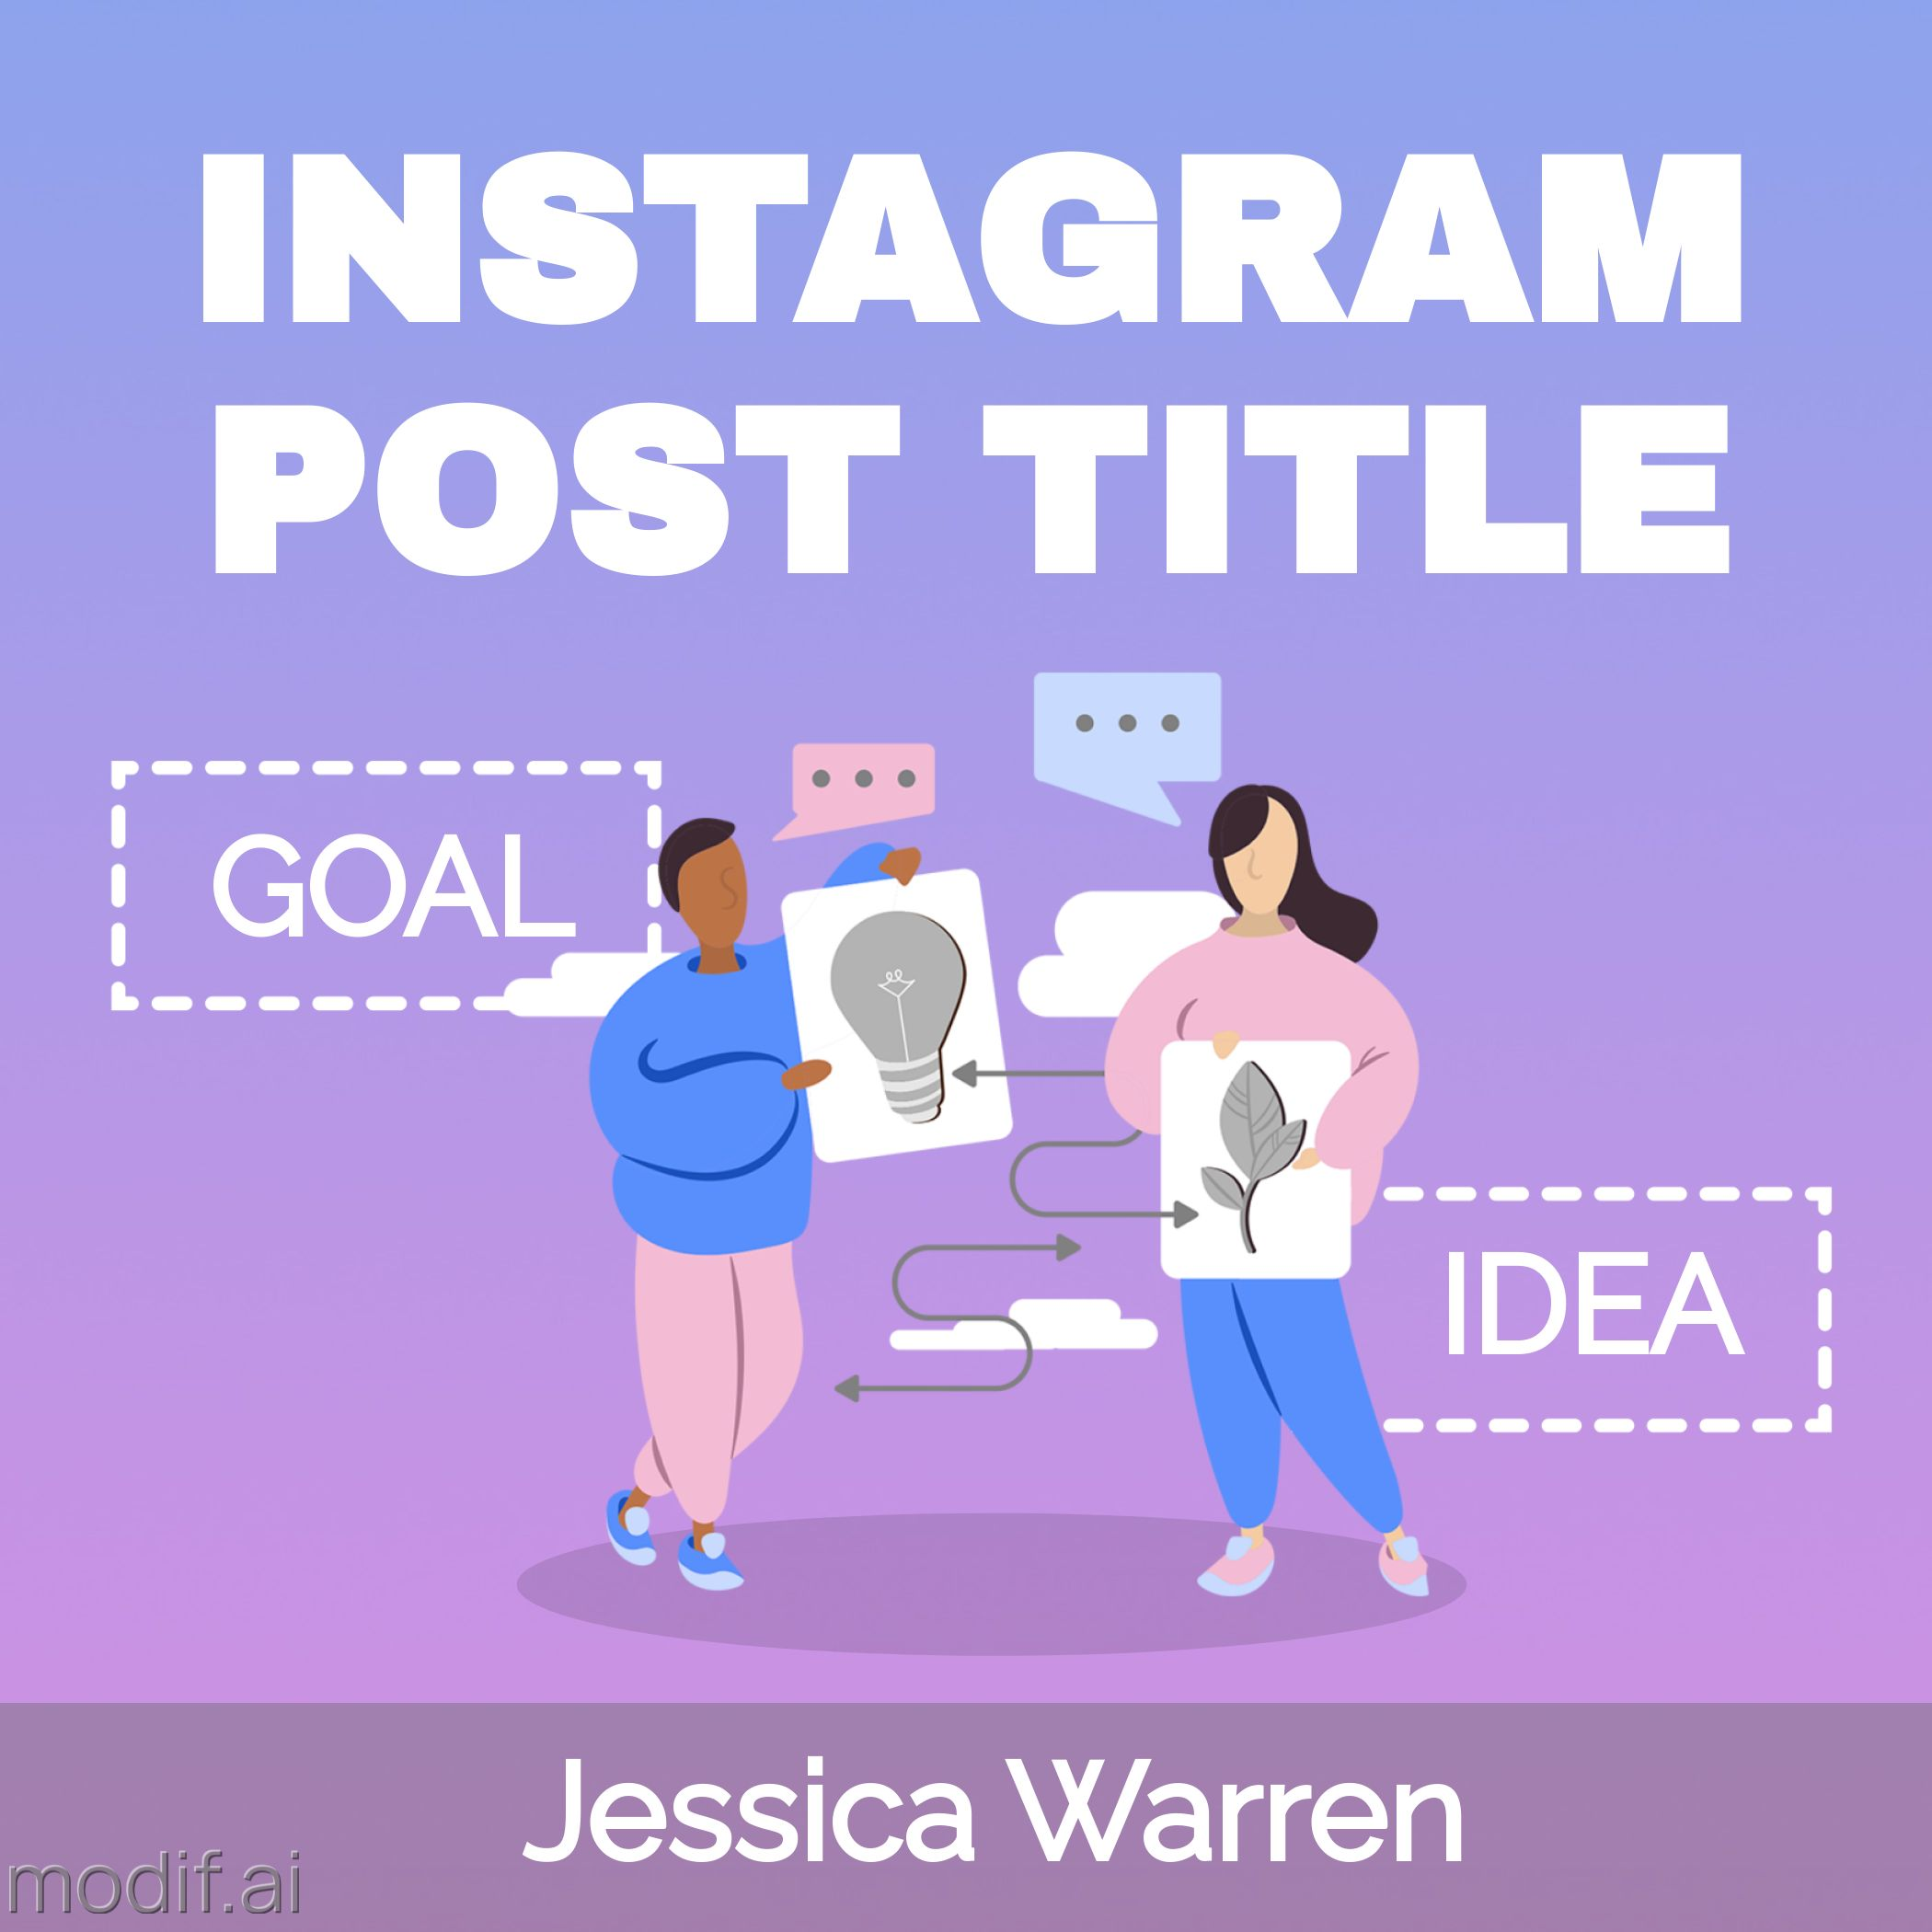 Idea Promotion Instagram Post Template